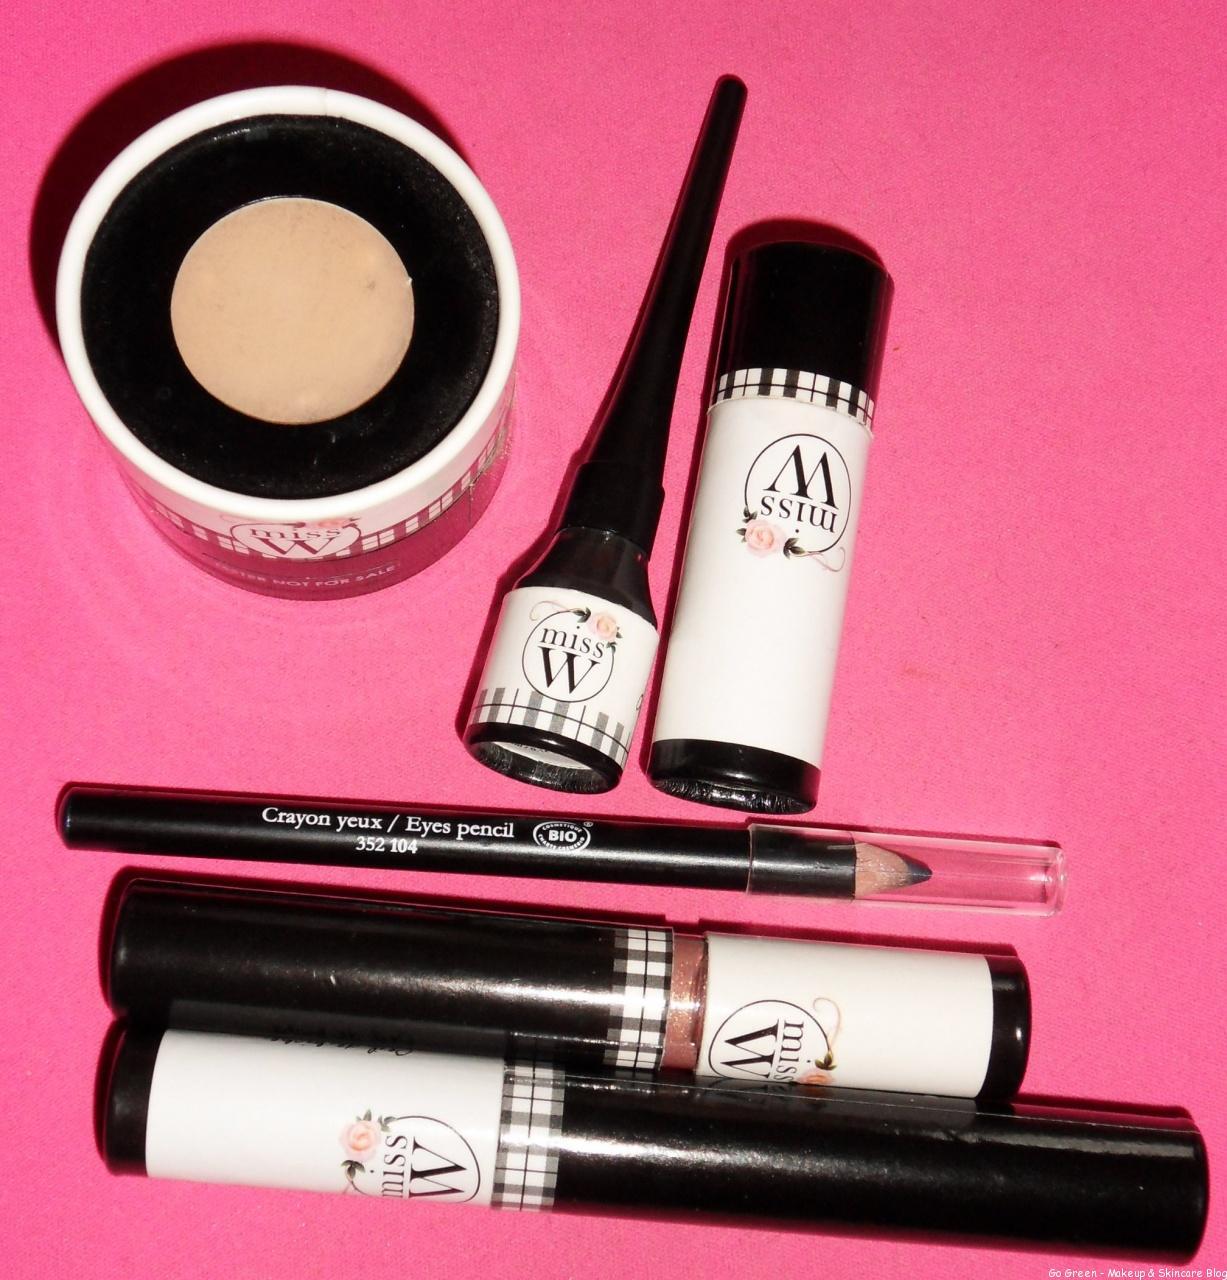 Miss W Makeup